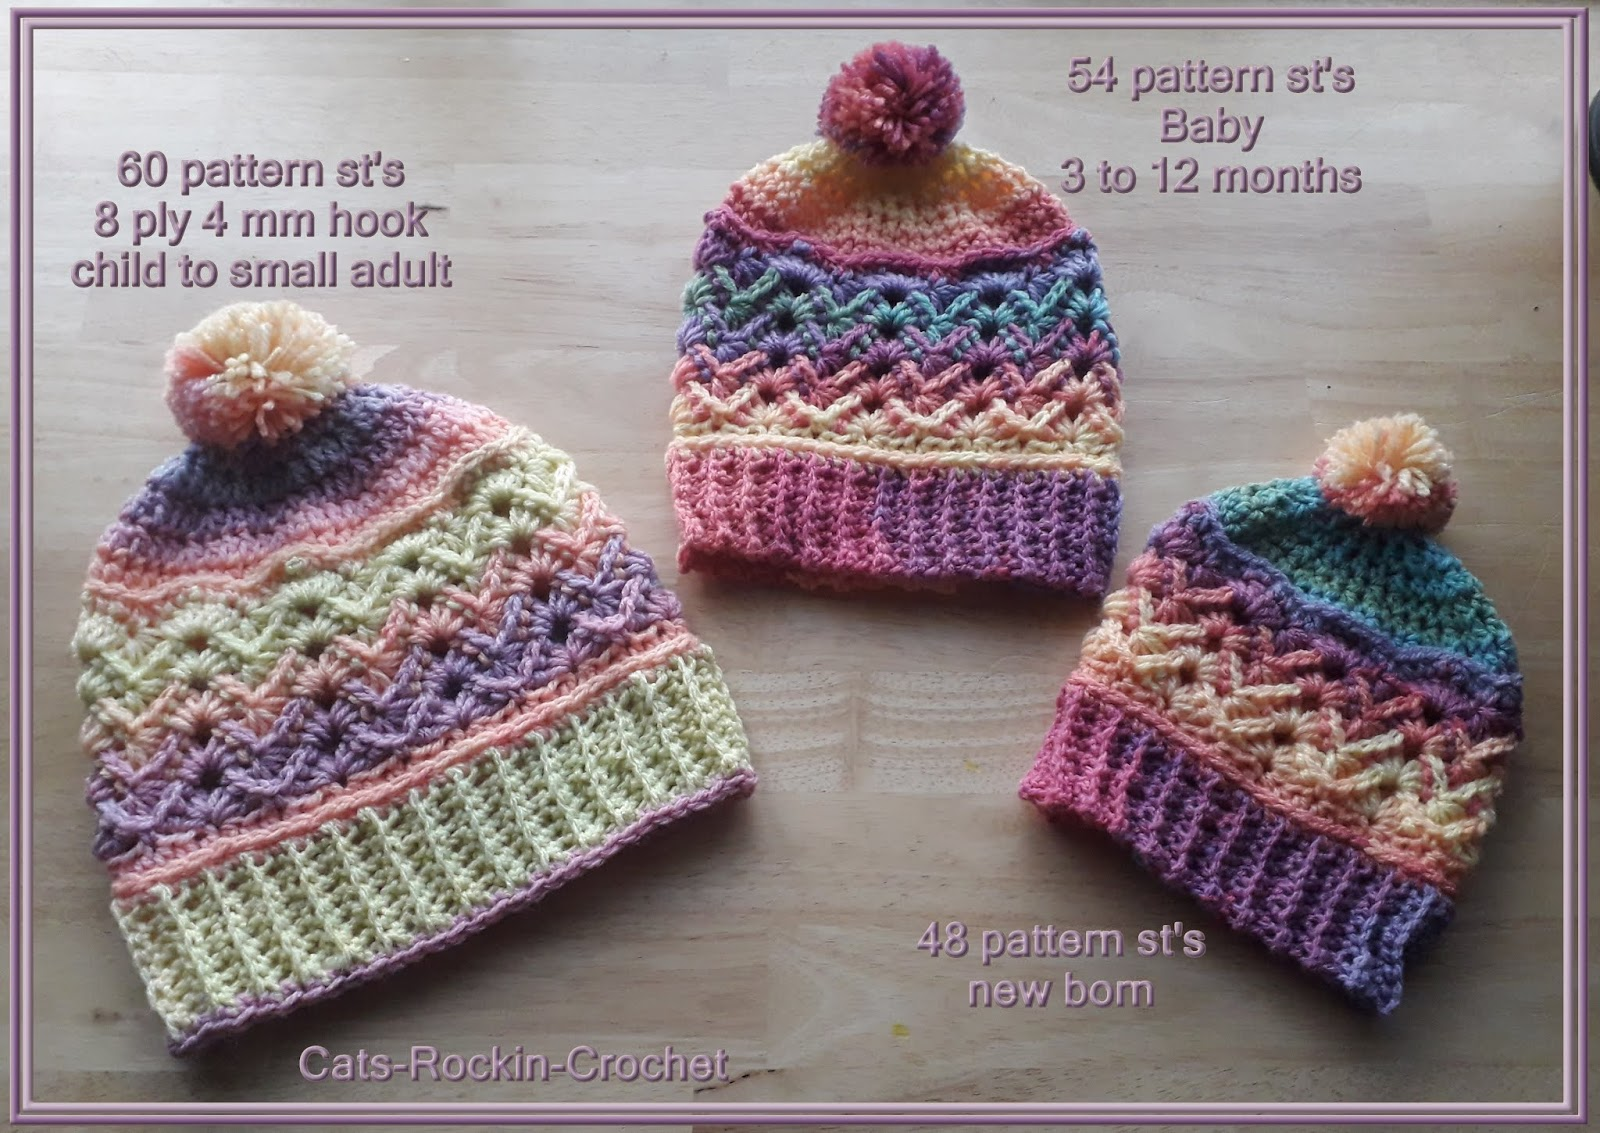 1e204e33ecd Free Crochet Patterns By Cats-Rockin-Crochet